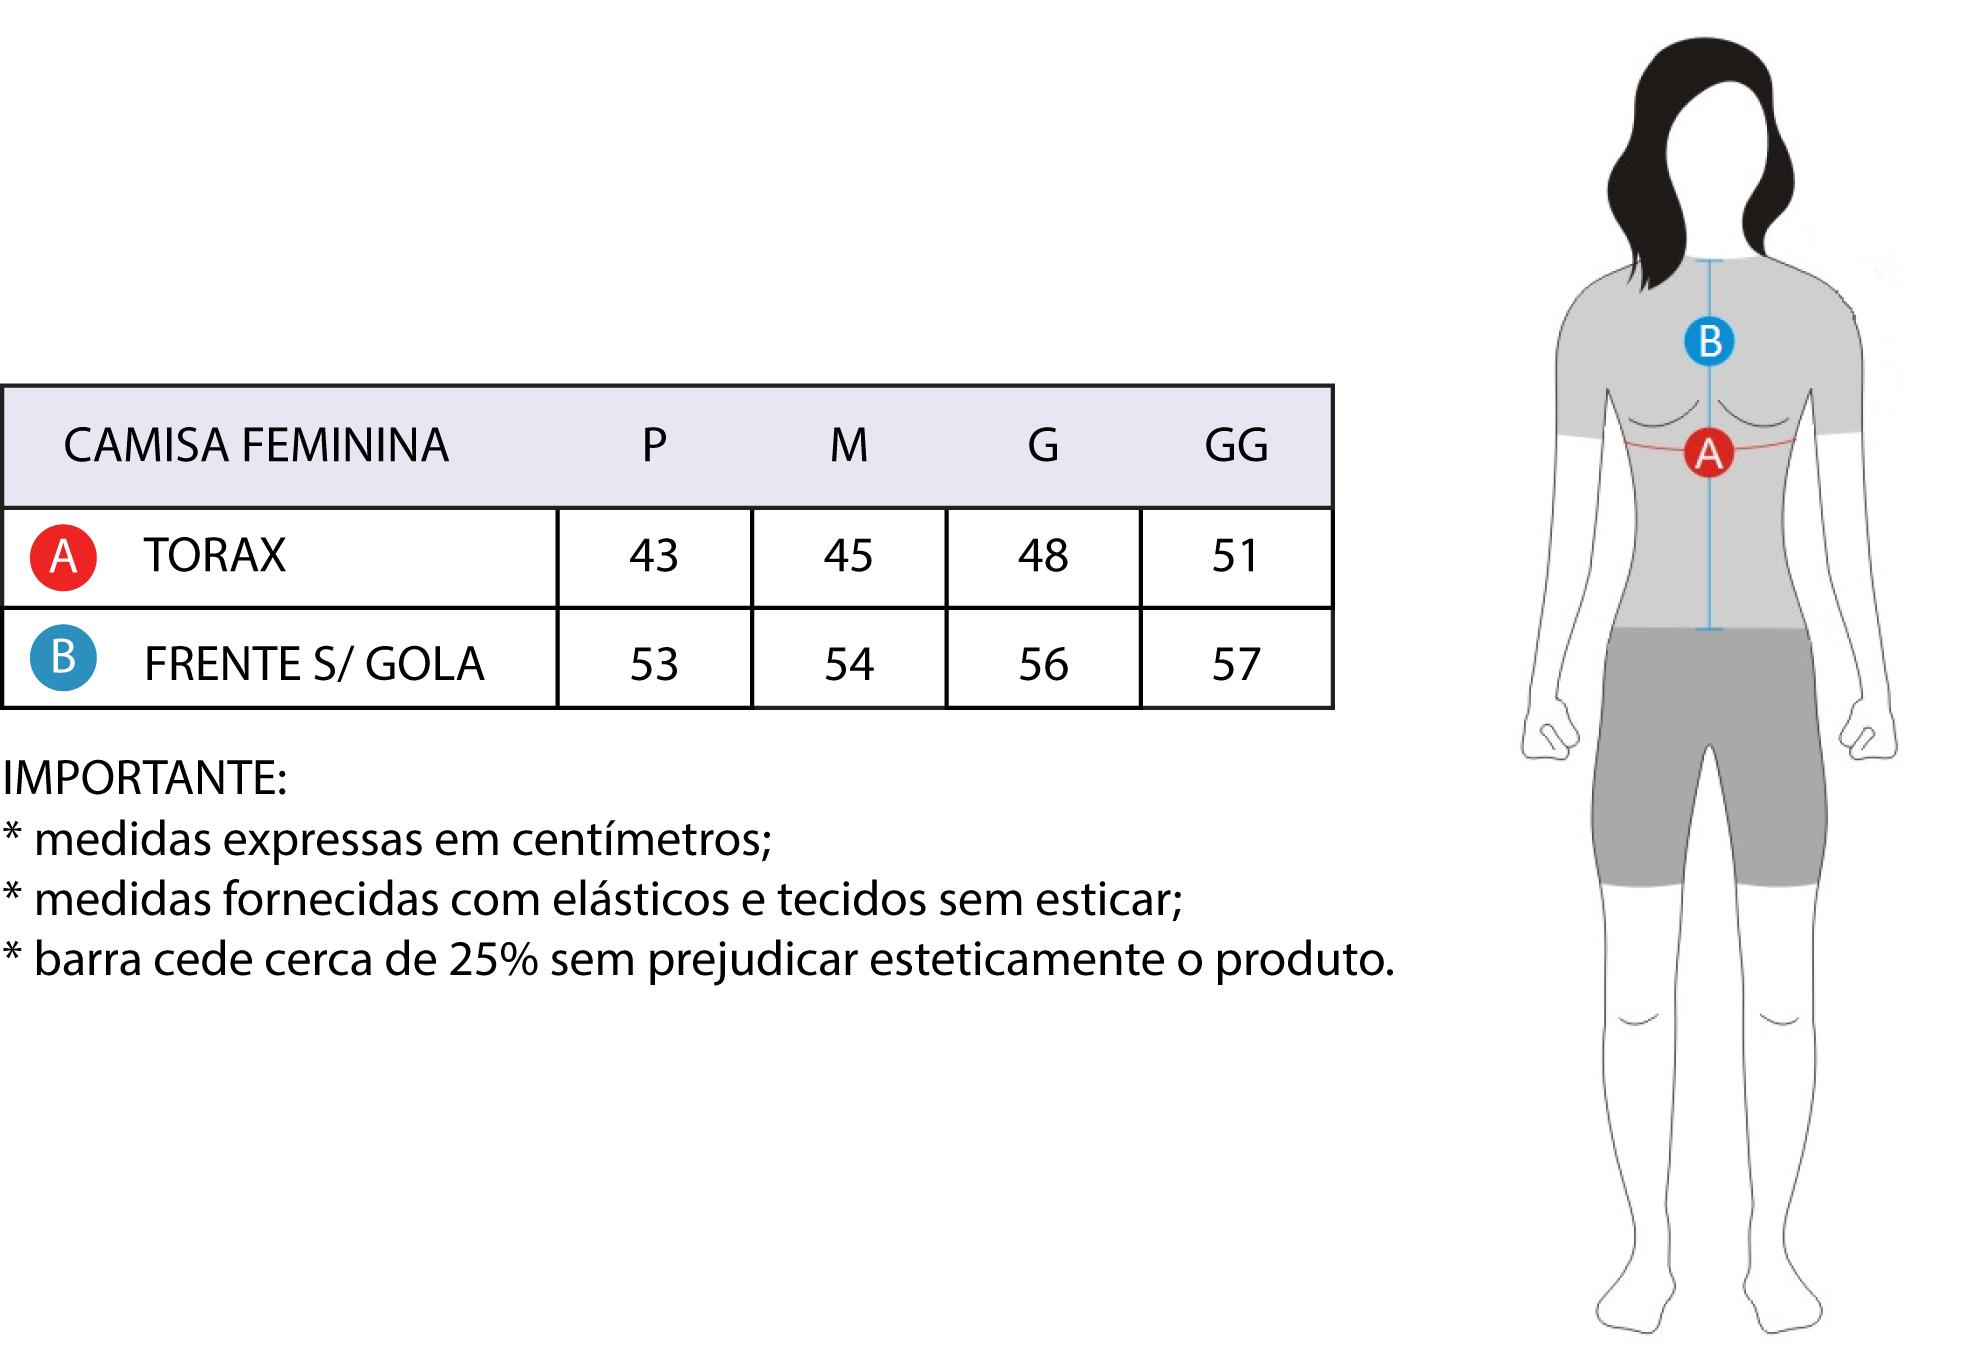 CAMISA FREEFORCE FEMININA STAGE PRETA E ROSA (MODELAGEM FIT) !